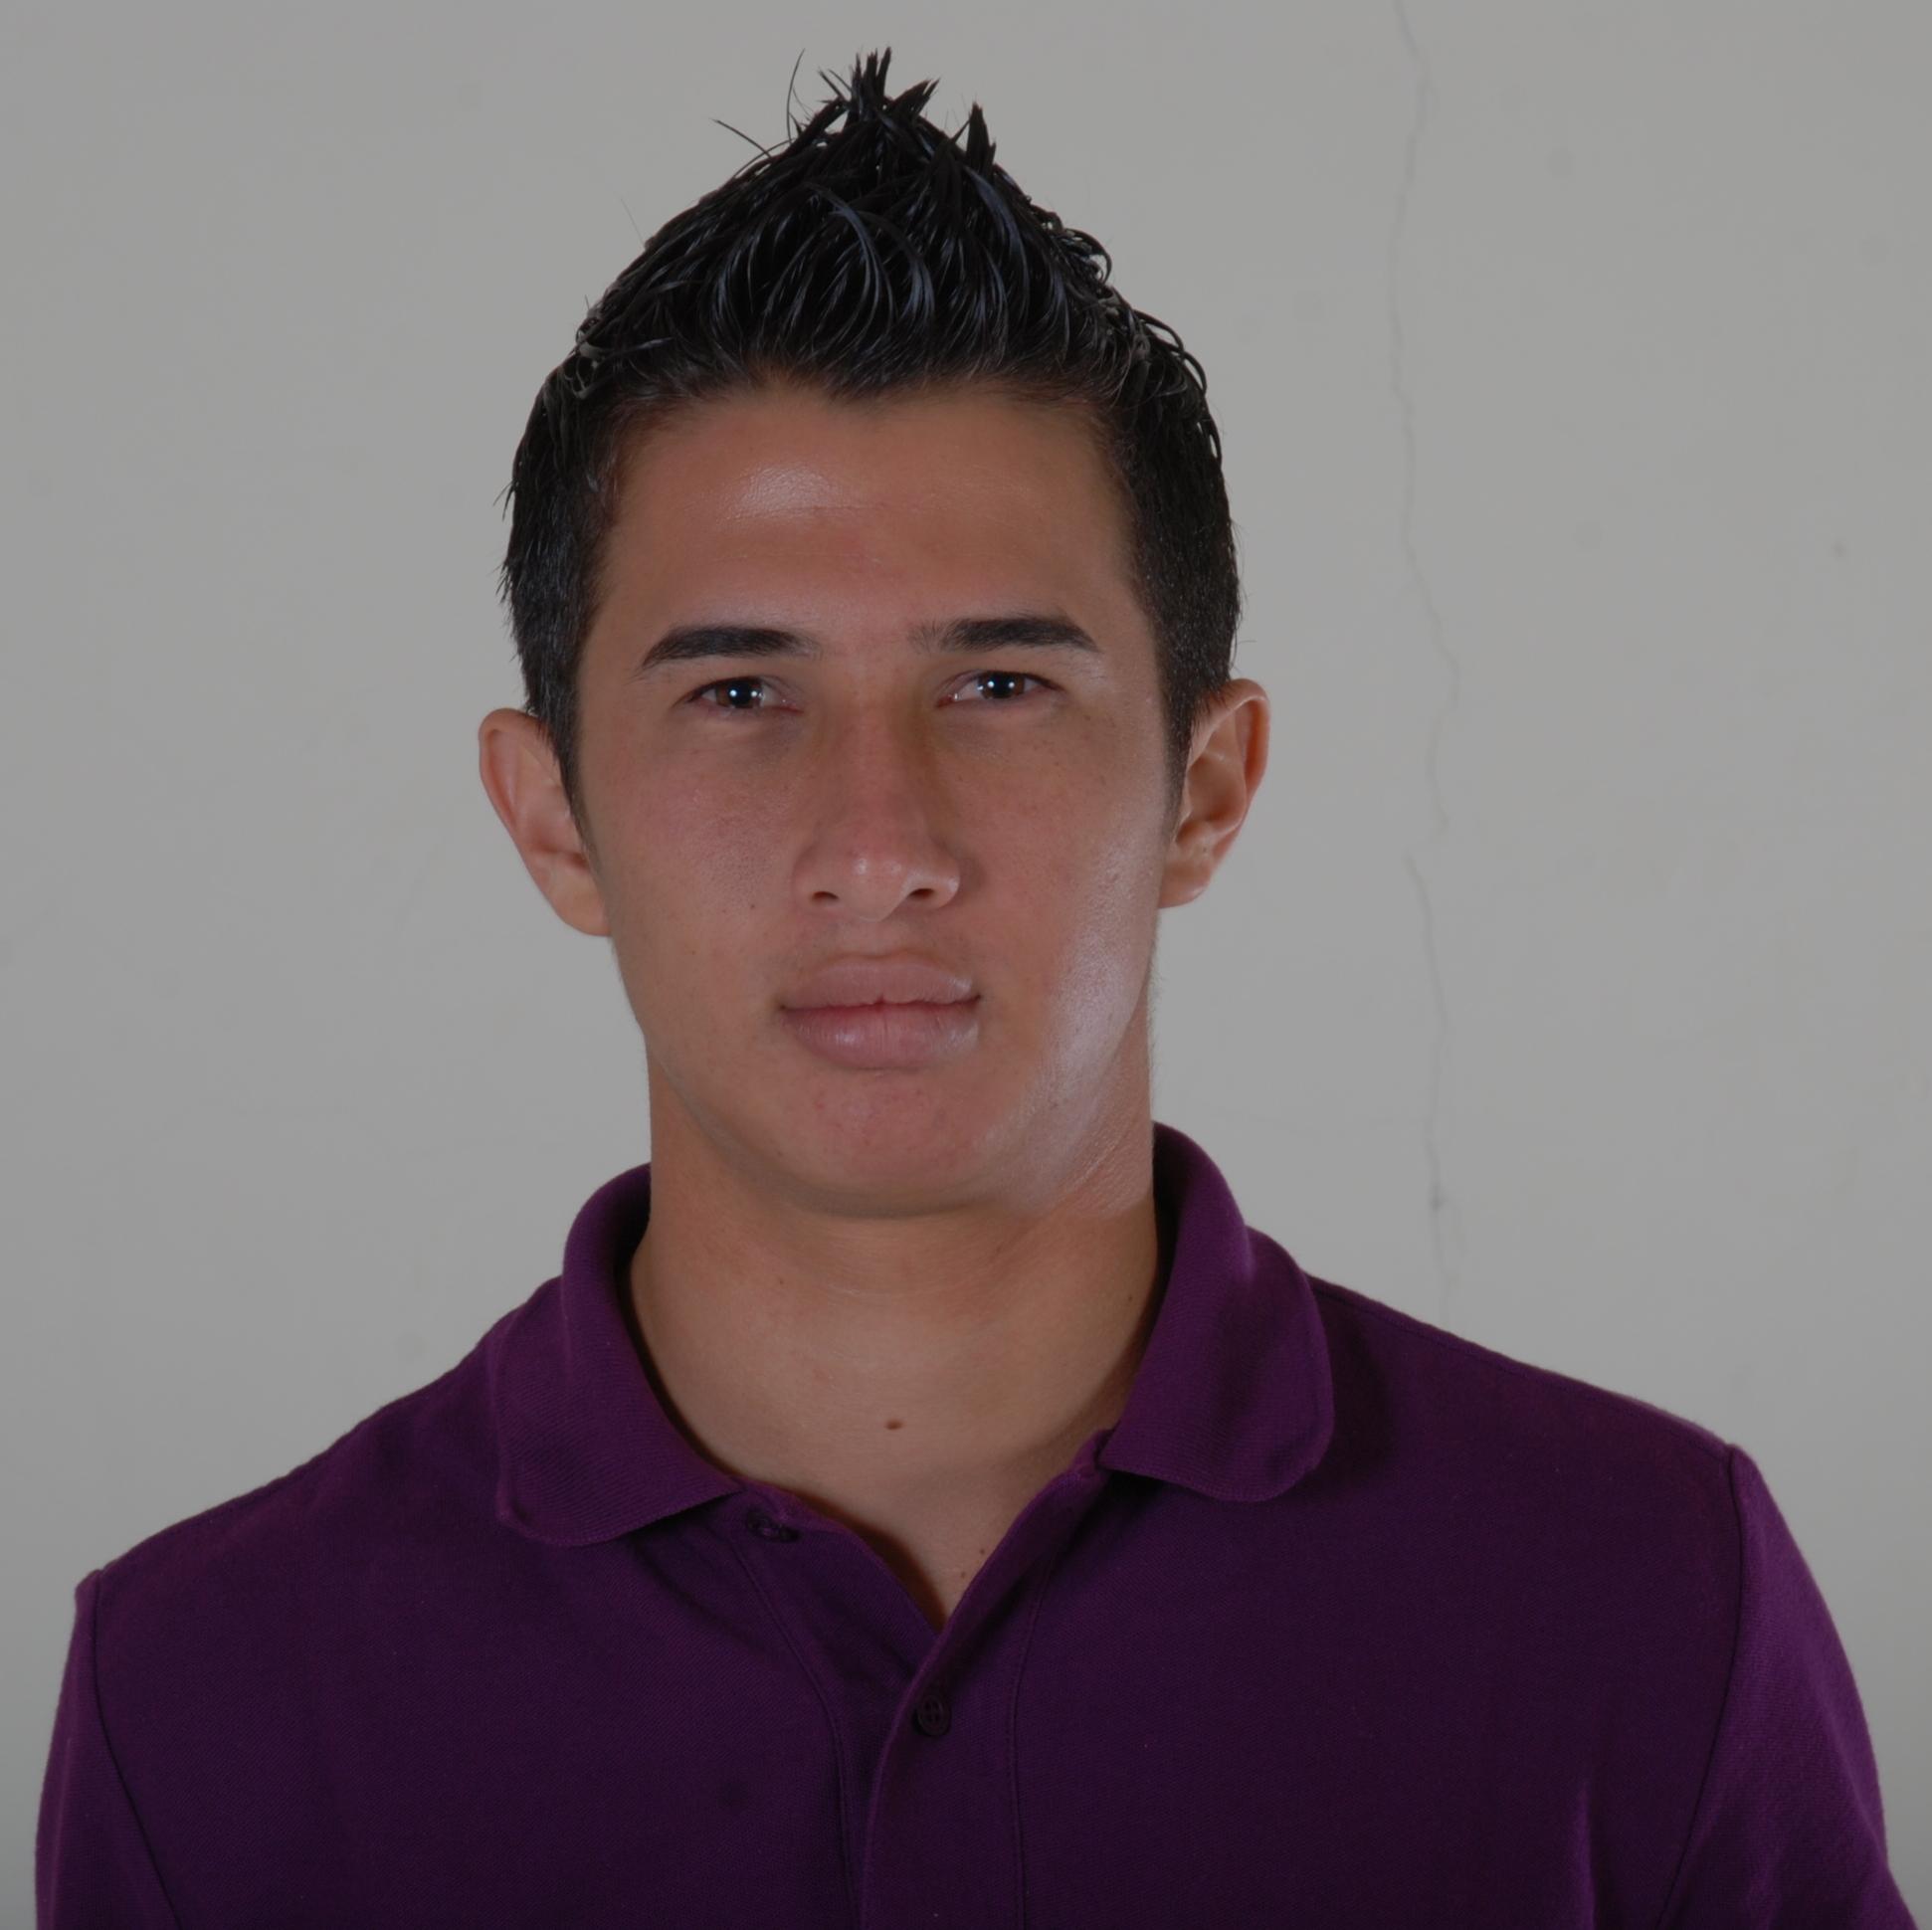 Jimmy Jose Cevallos Bumbila